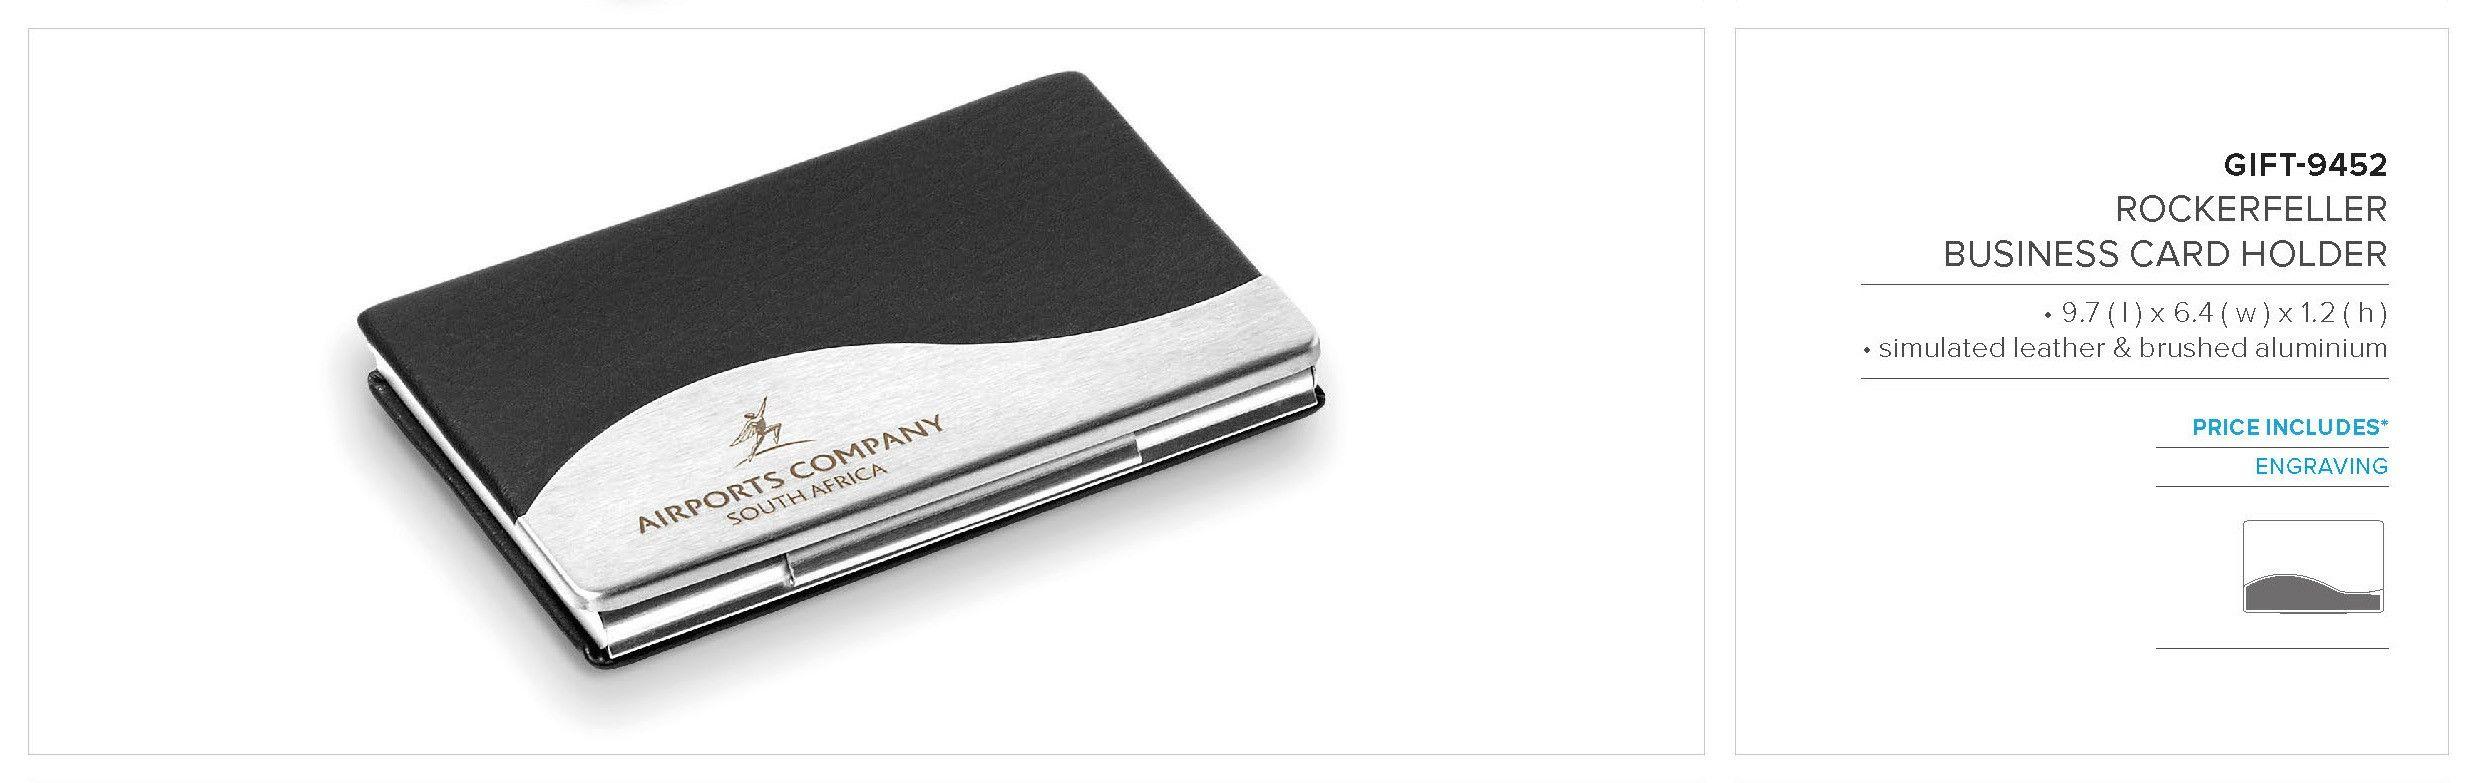 Branded Rockefeller Business Card Holder Corporate Gifts Business Gifts Corporate Outfits